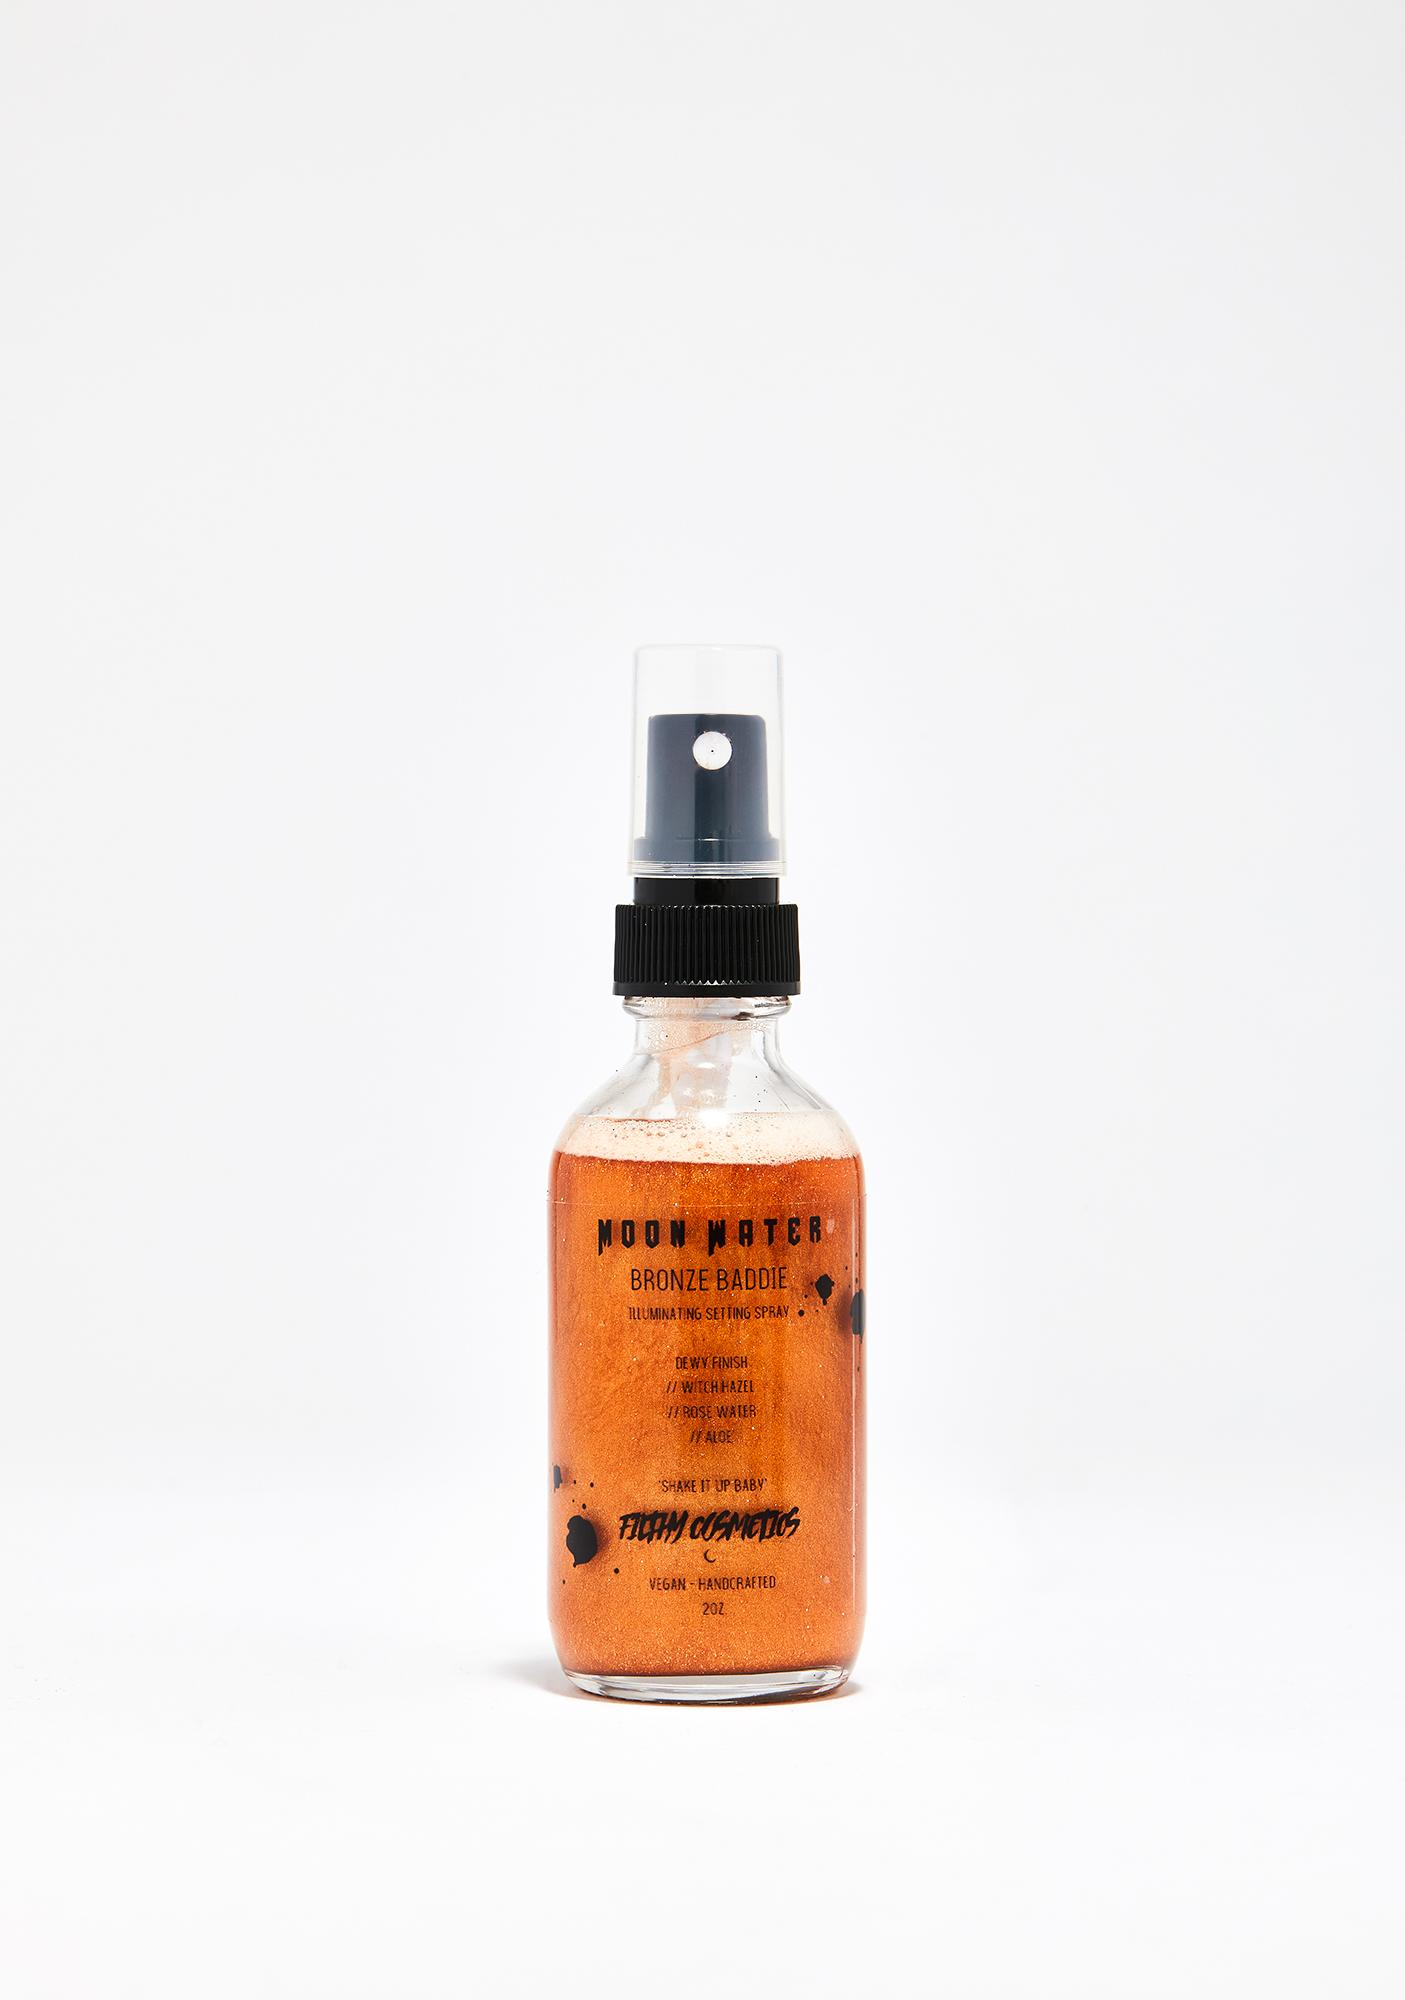 Filthy Cosmetics Bronze Baddie Setting Spray